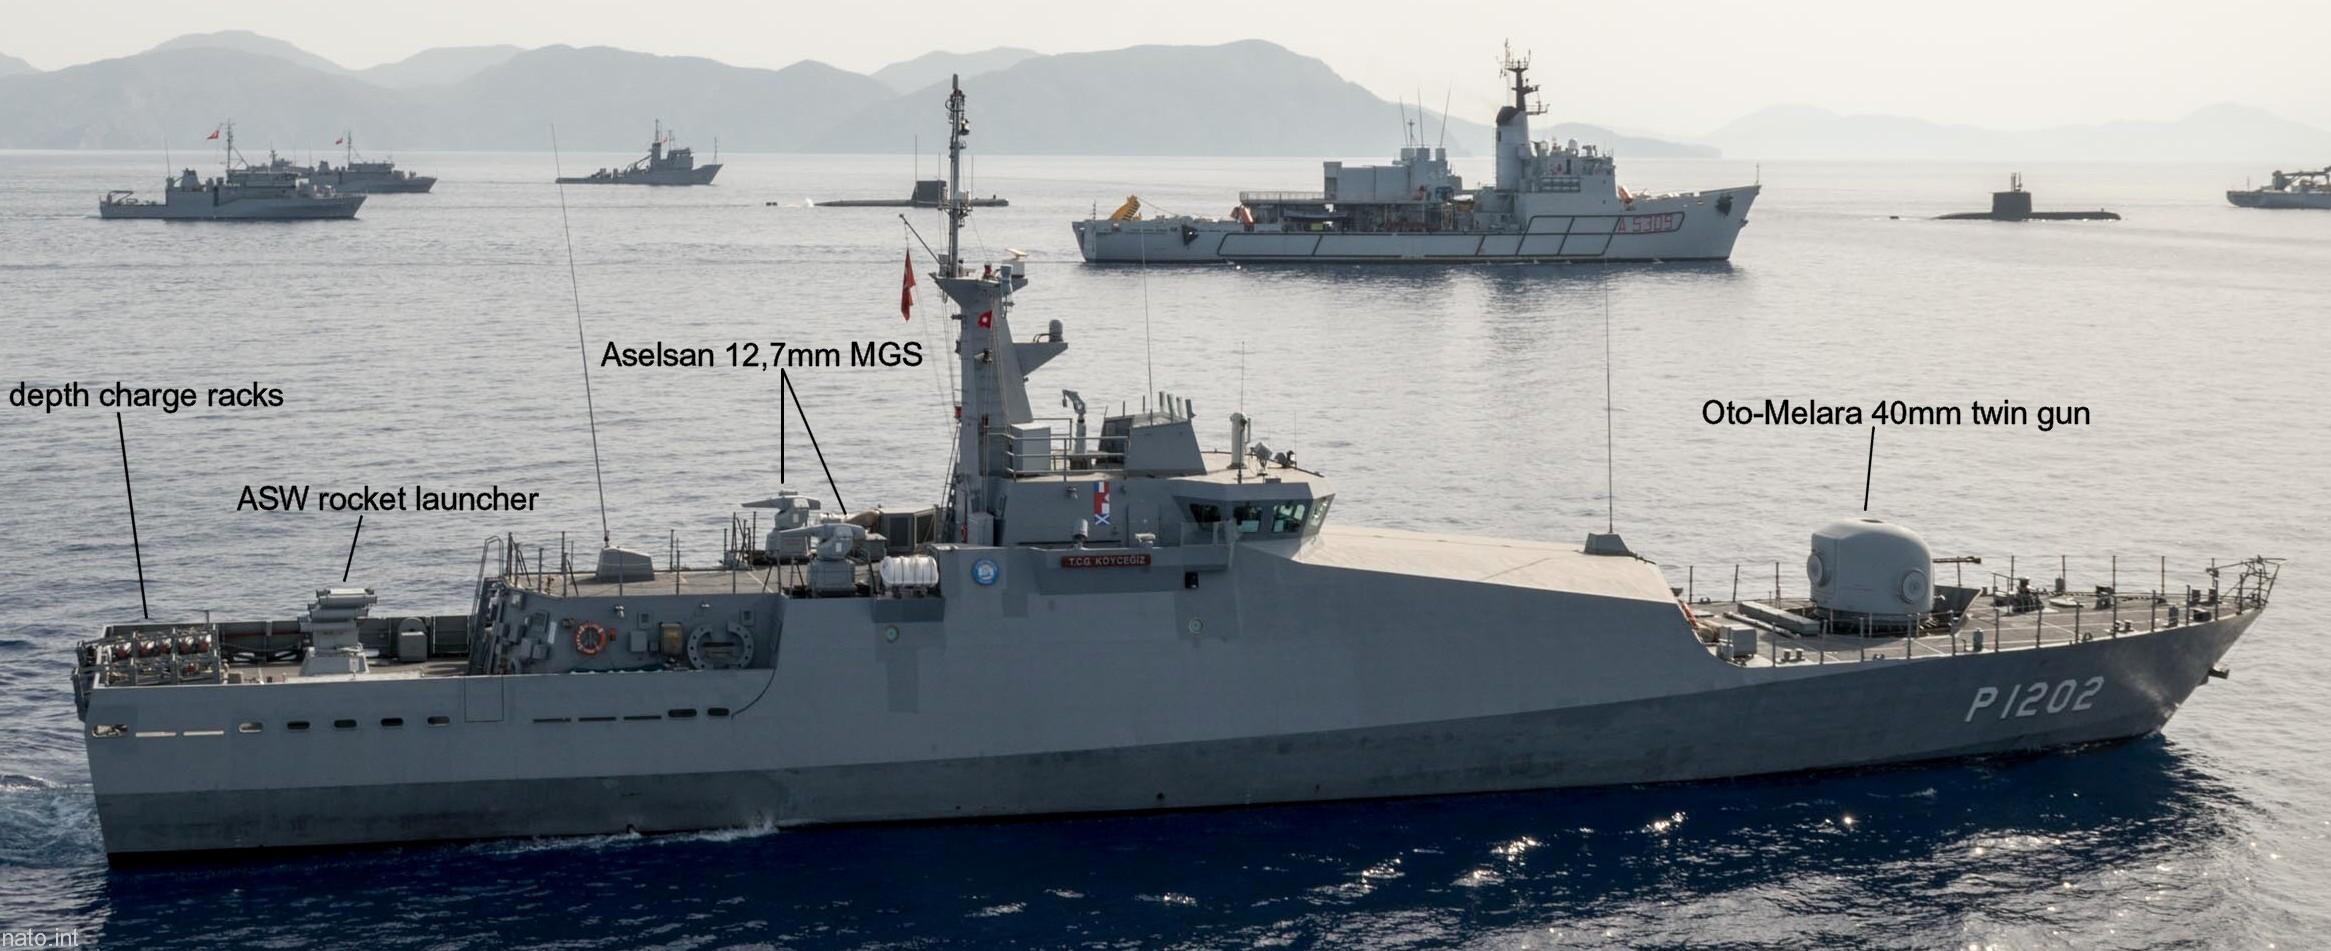 Unidades que pudiera poseer la Armada - Página 24 Tuzla-class-armament-02